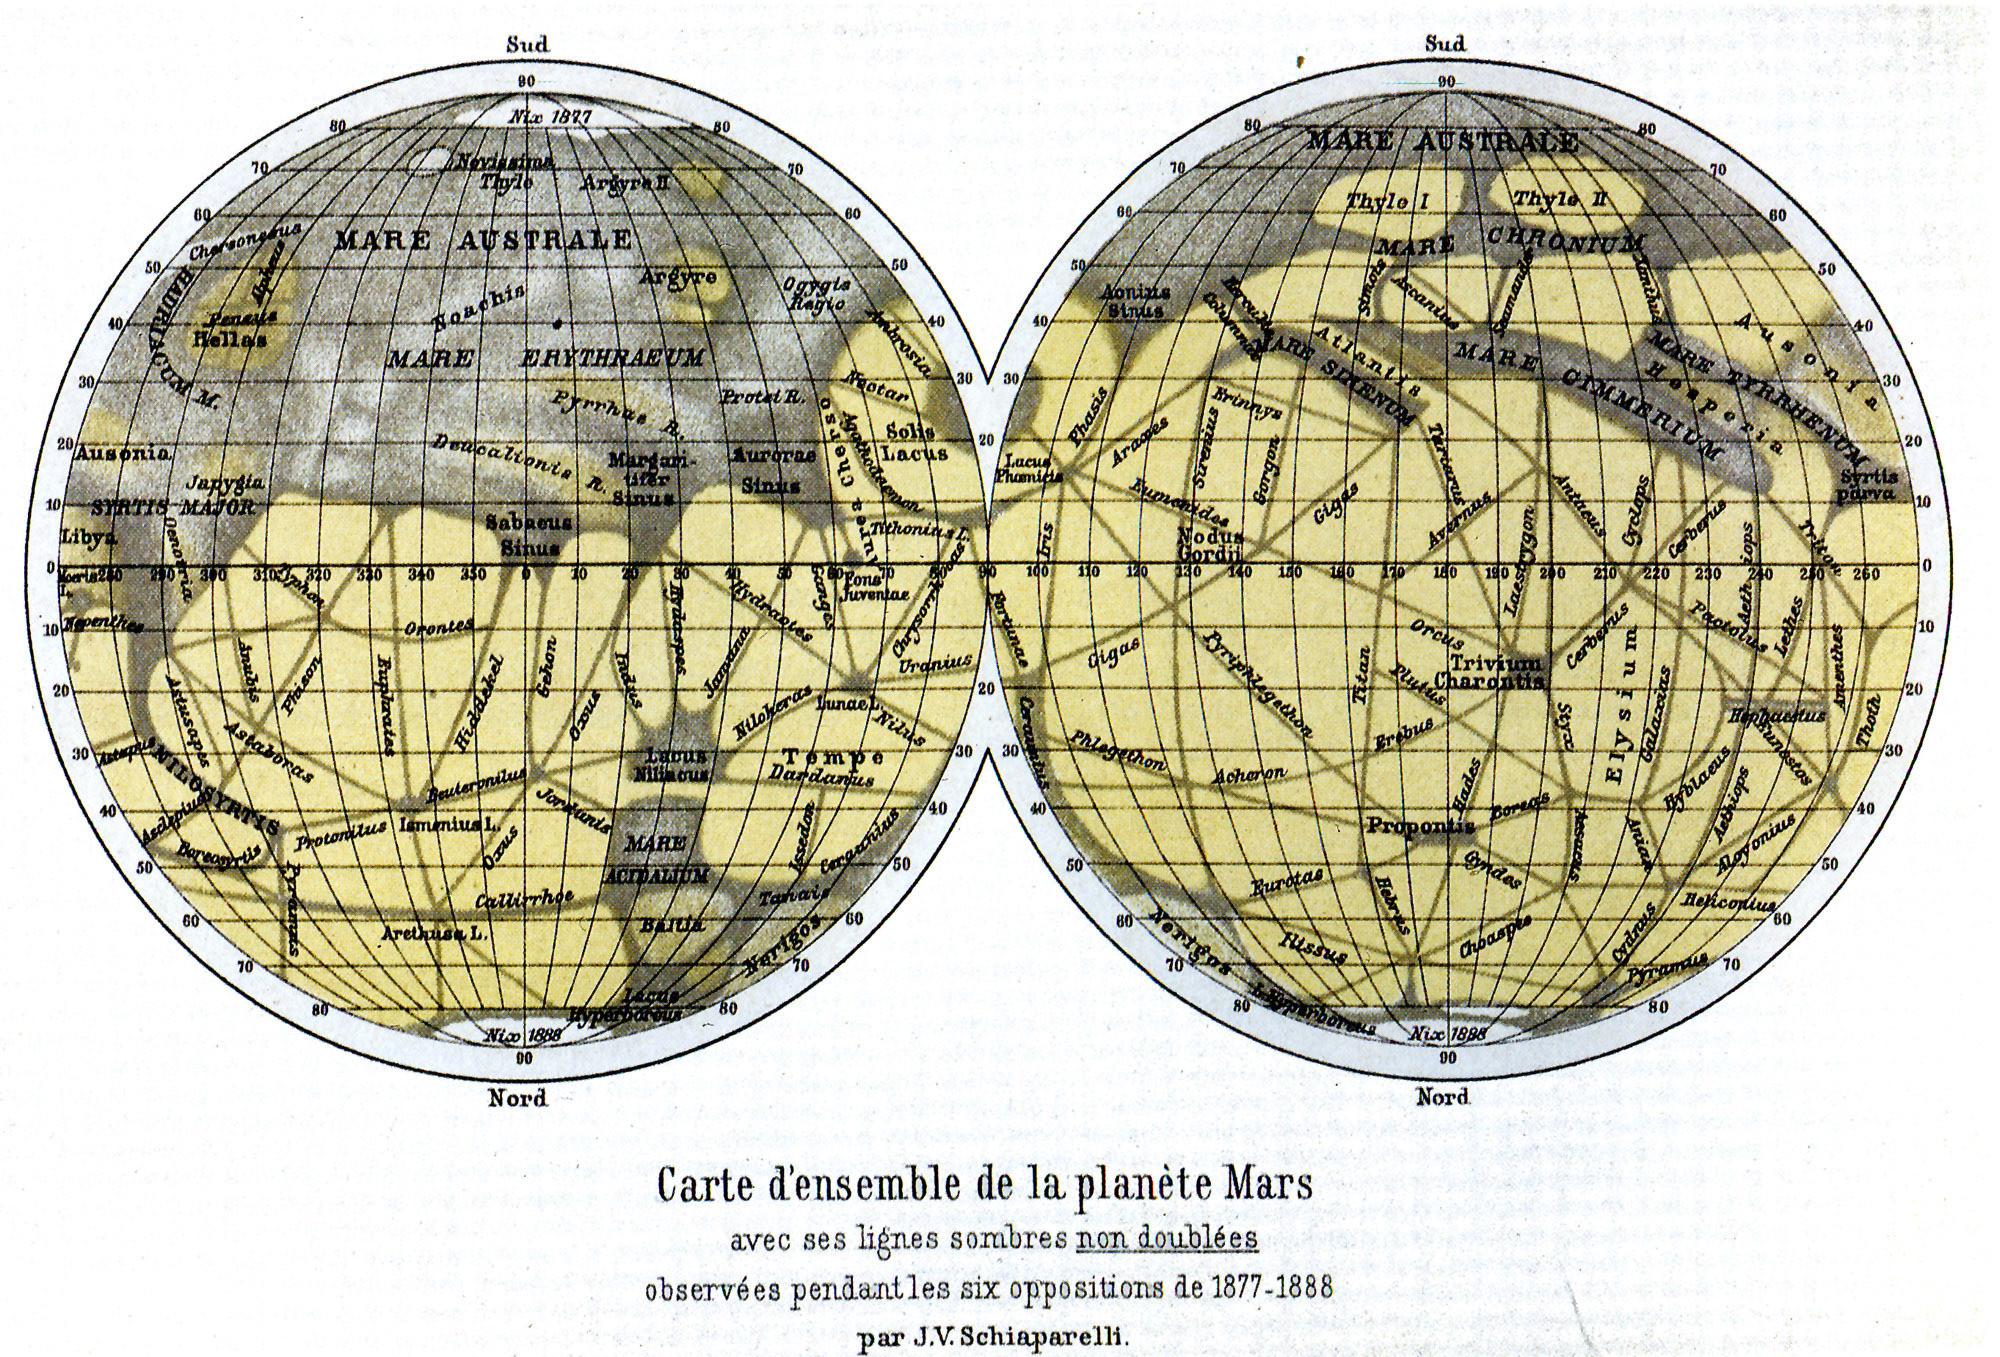 Atlas of Mars by Giovanni Schiaparelli, made in 1888.